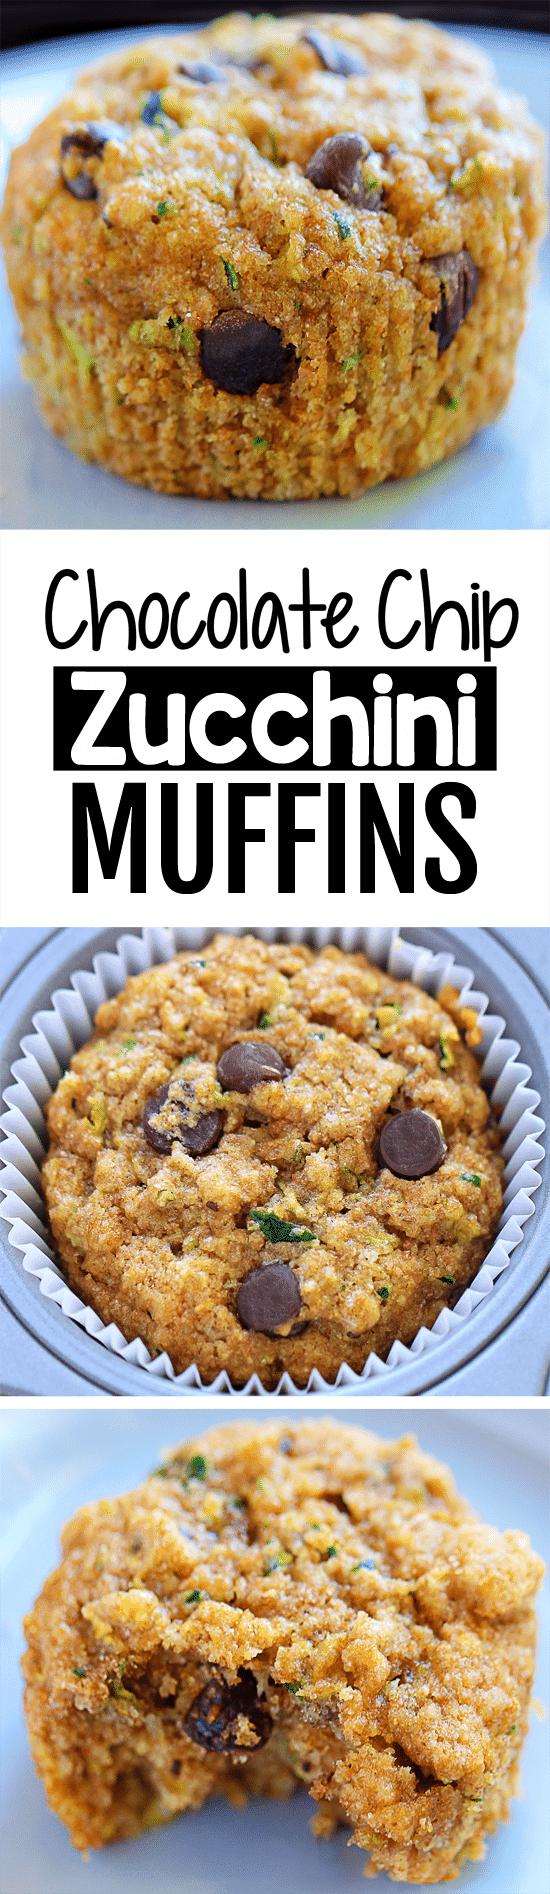 Homemade Healthy Chocolate Chip Zucchini Muffin Recipe